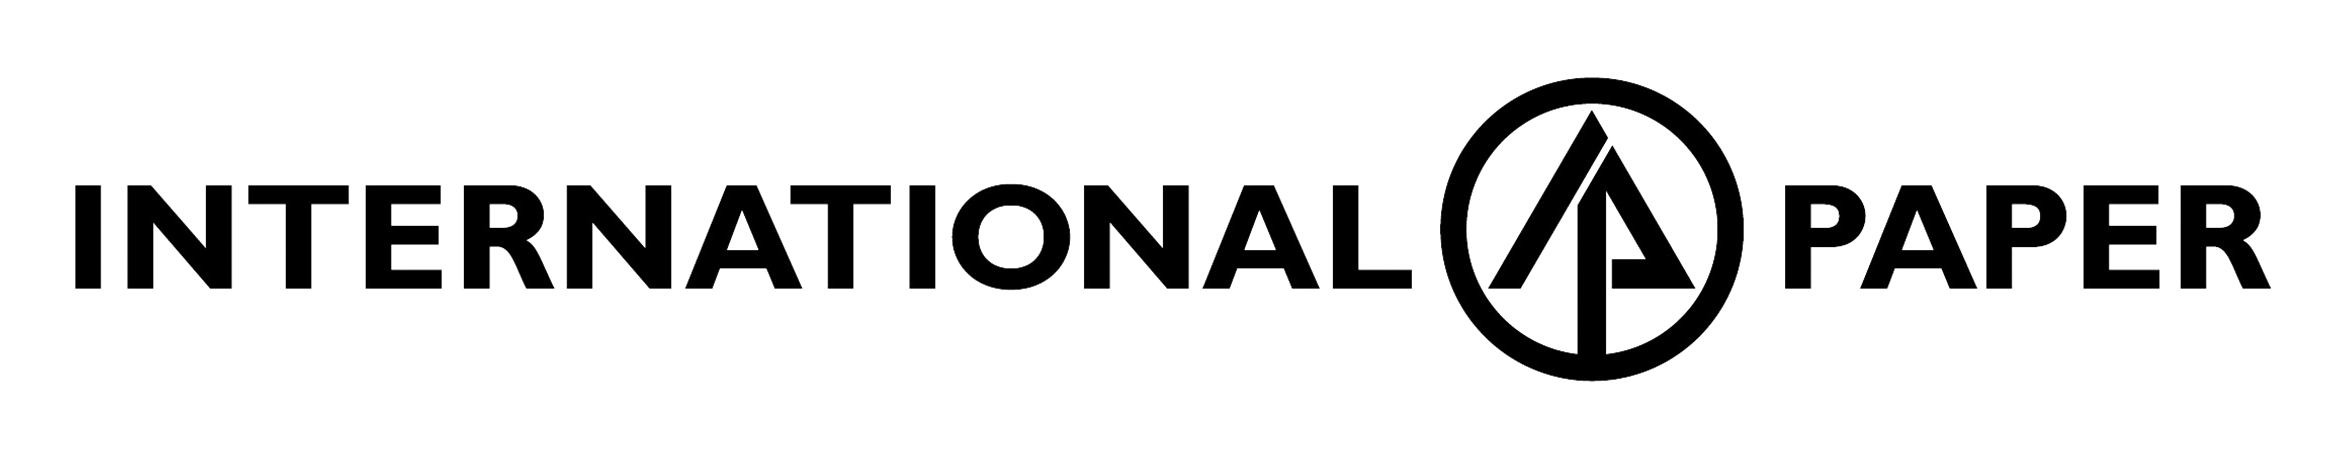 International-Paper-Logo-PNG-Transparent